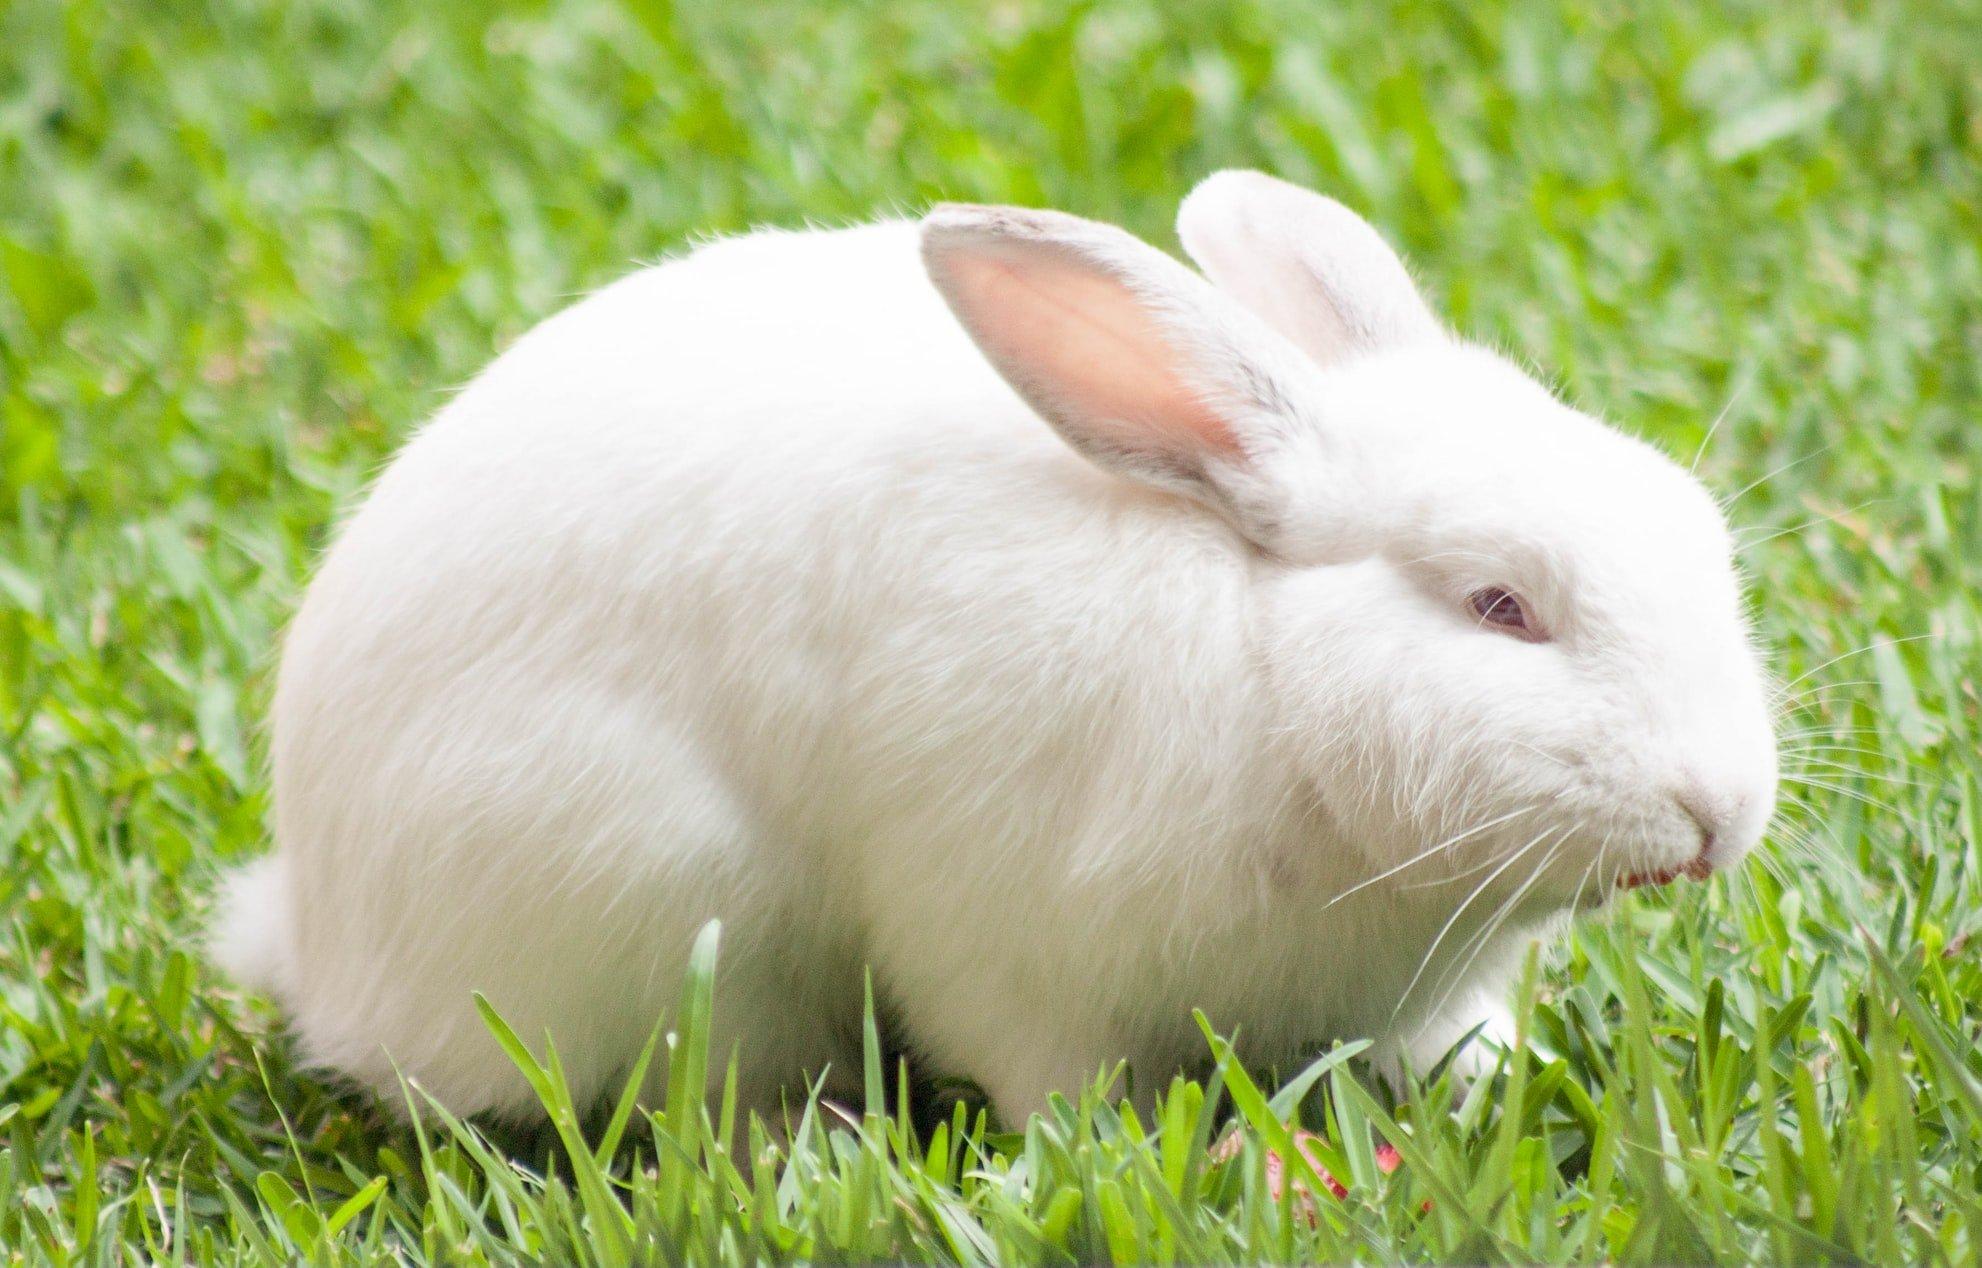 Why does my rabbit headbutt me